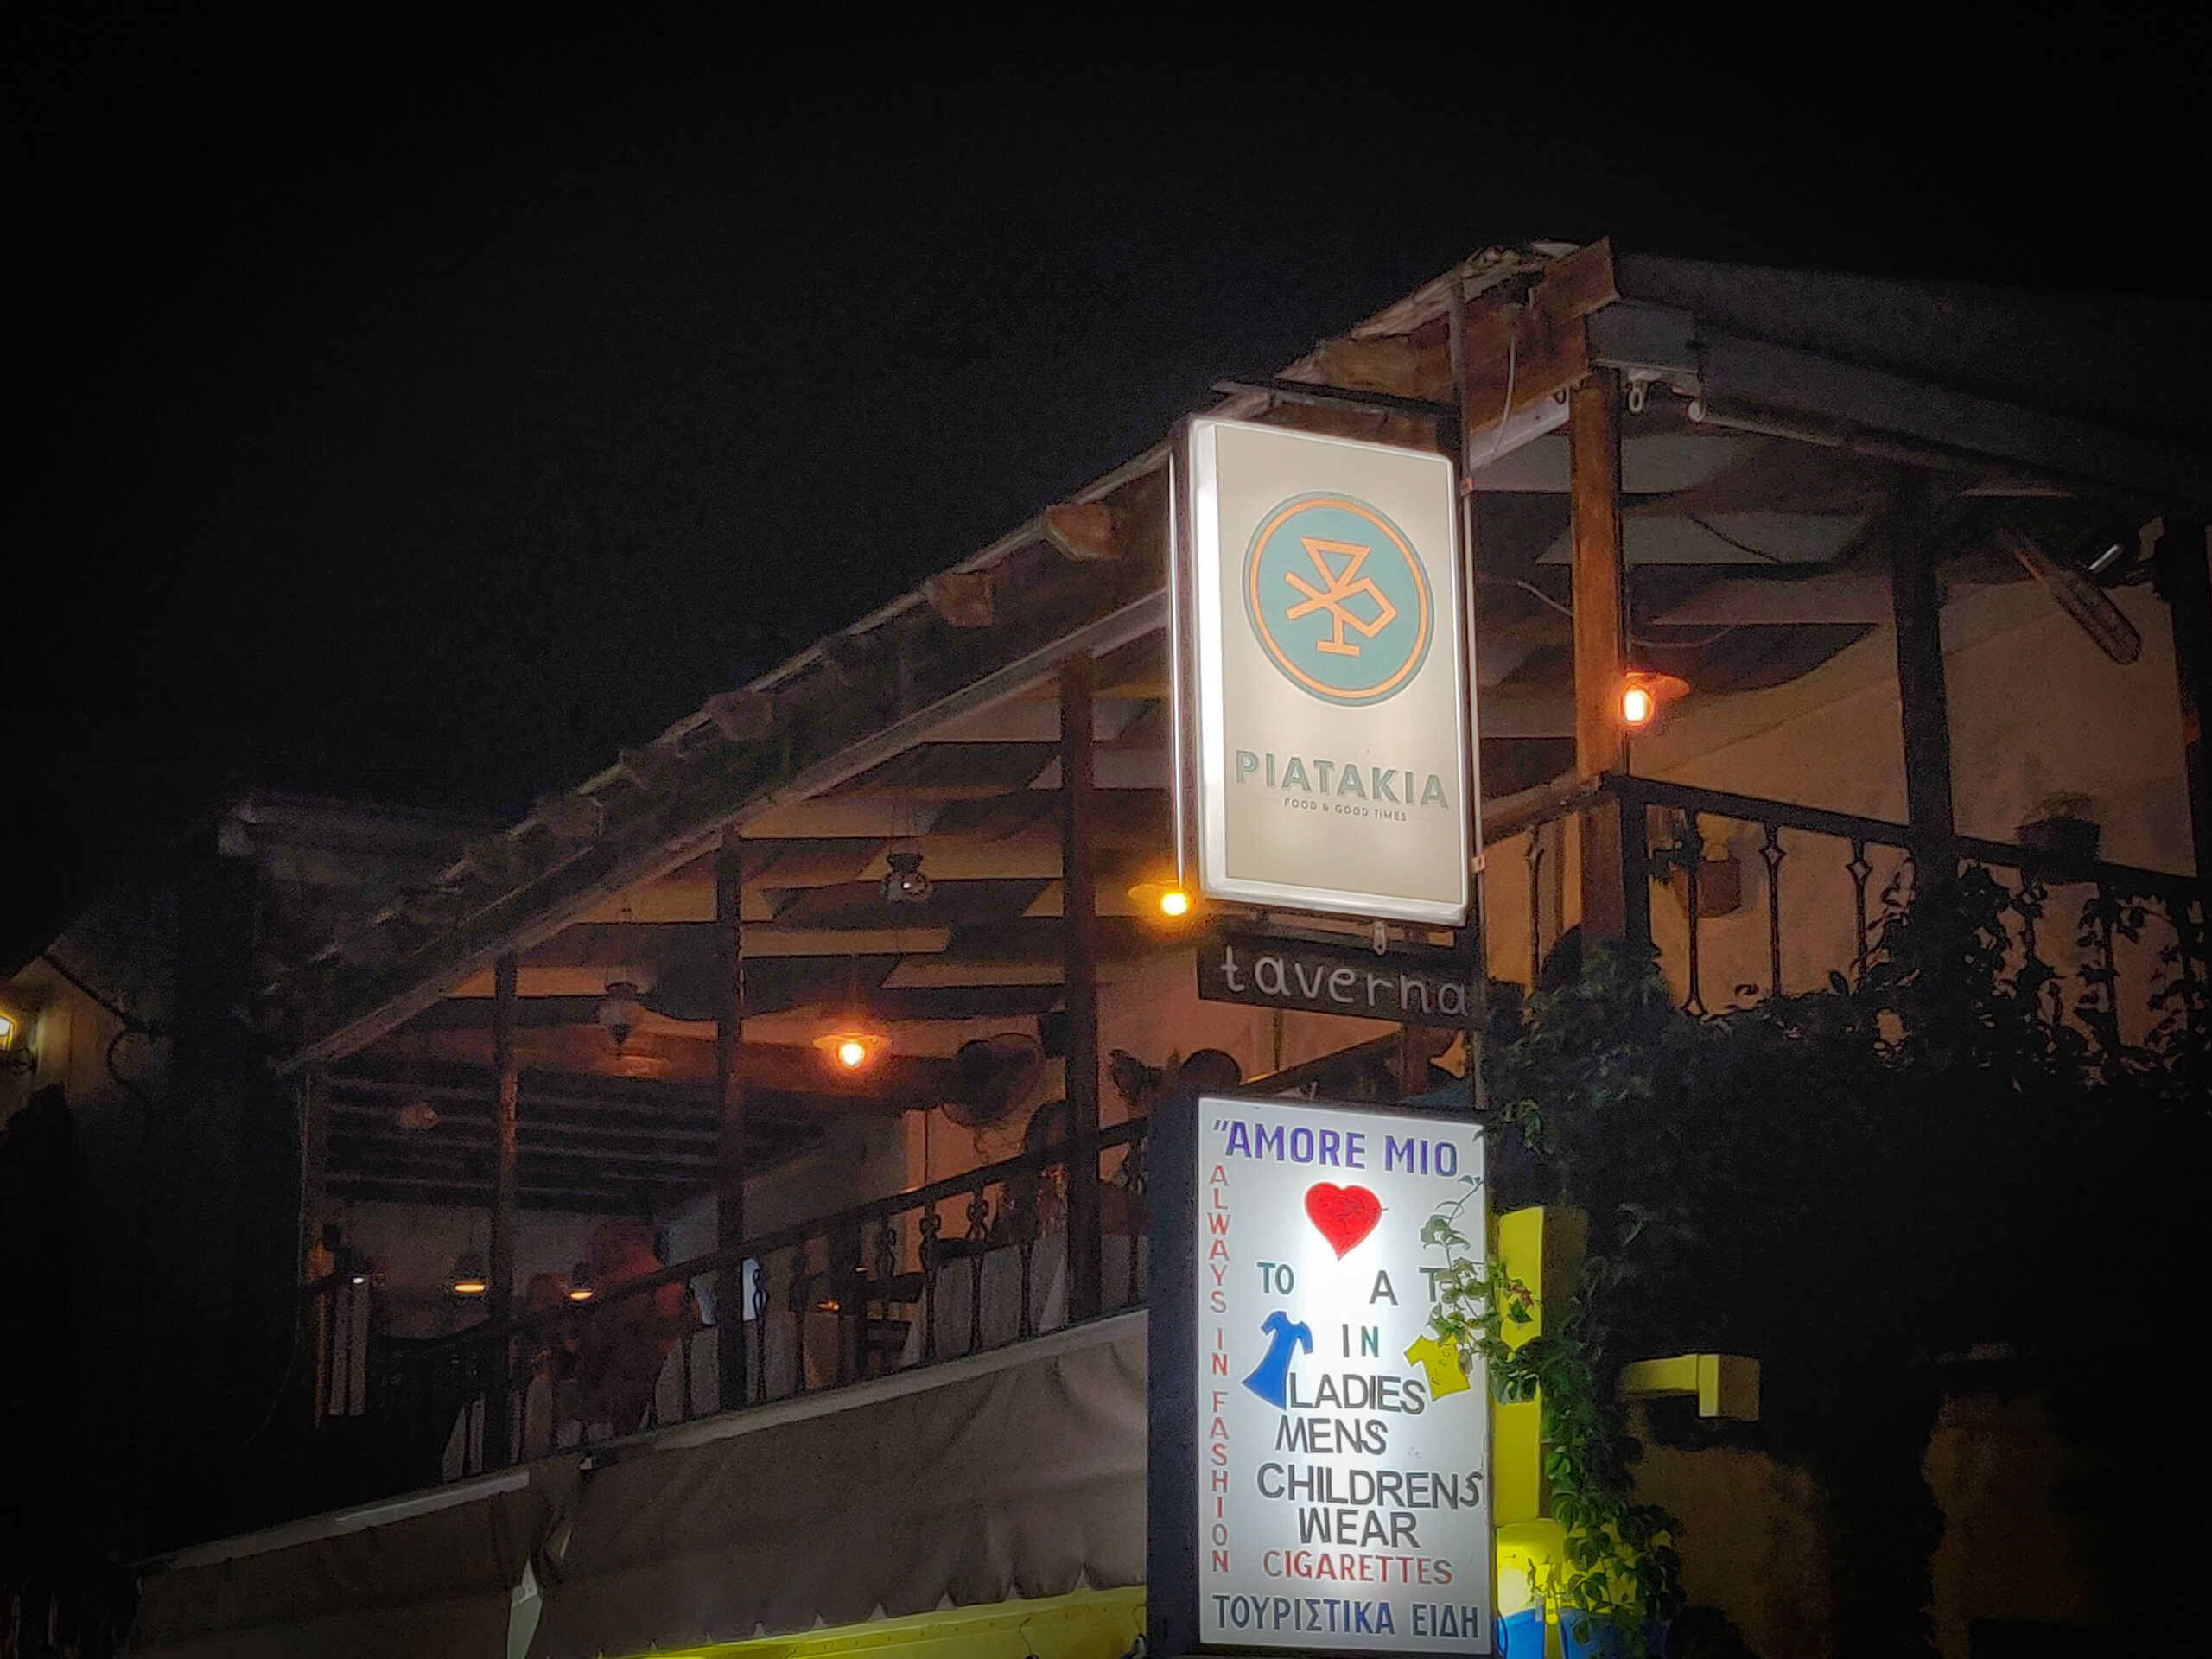 Restaurant Piatakia in Rhodes: A Modern Rhodian Take on the Traditional Greek Palate